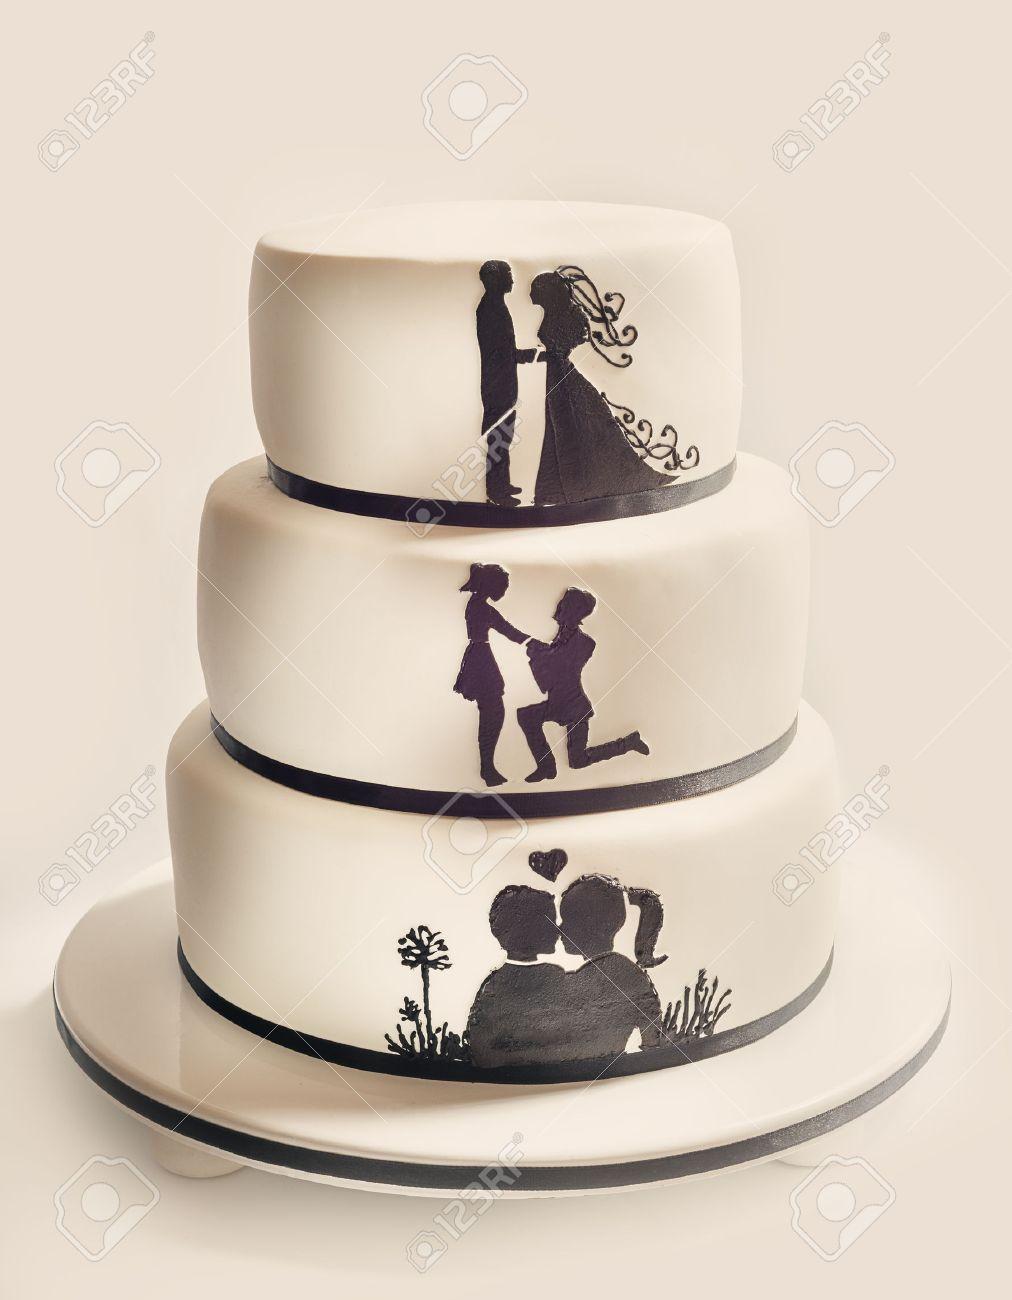 Awesome Peter Pan Wedding Cake Vignette - The Wedding Ideas ...